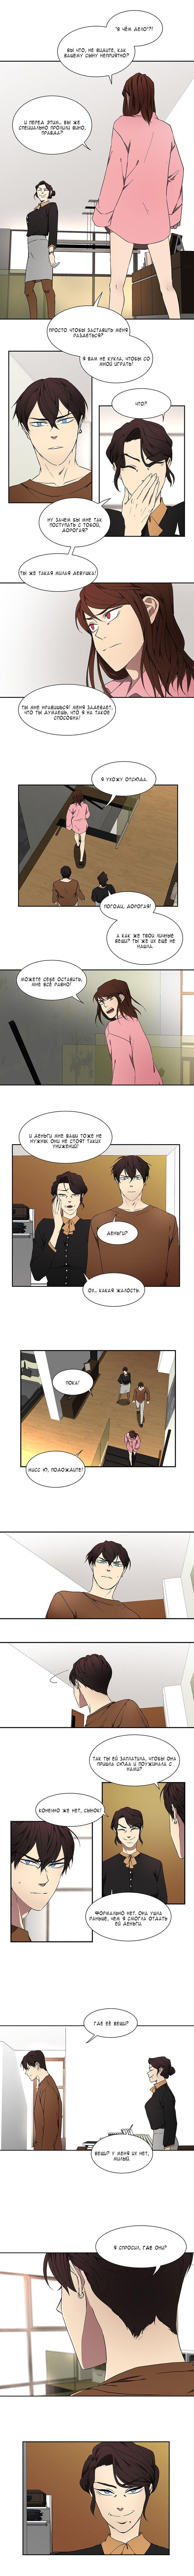 Манга Я люблю Ю / I love Yoo  - Том 1 Глава 41 Страница 2